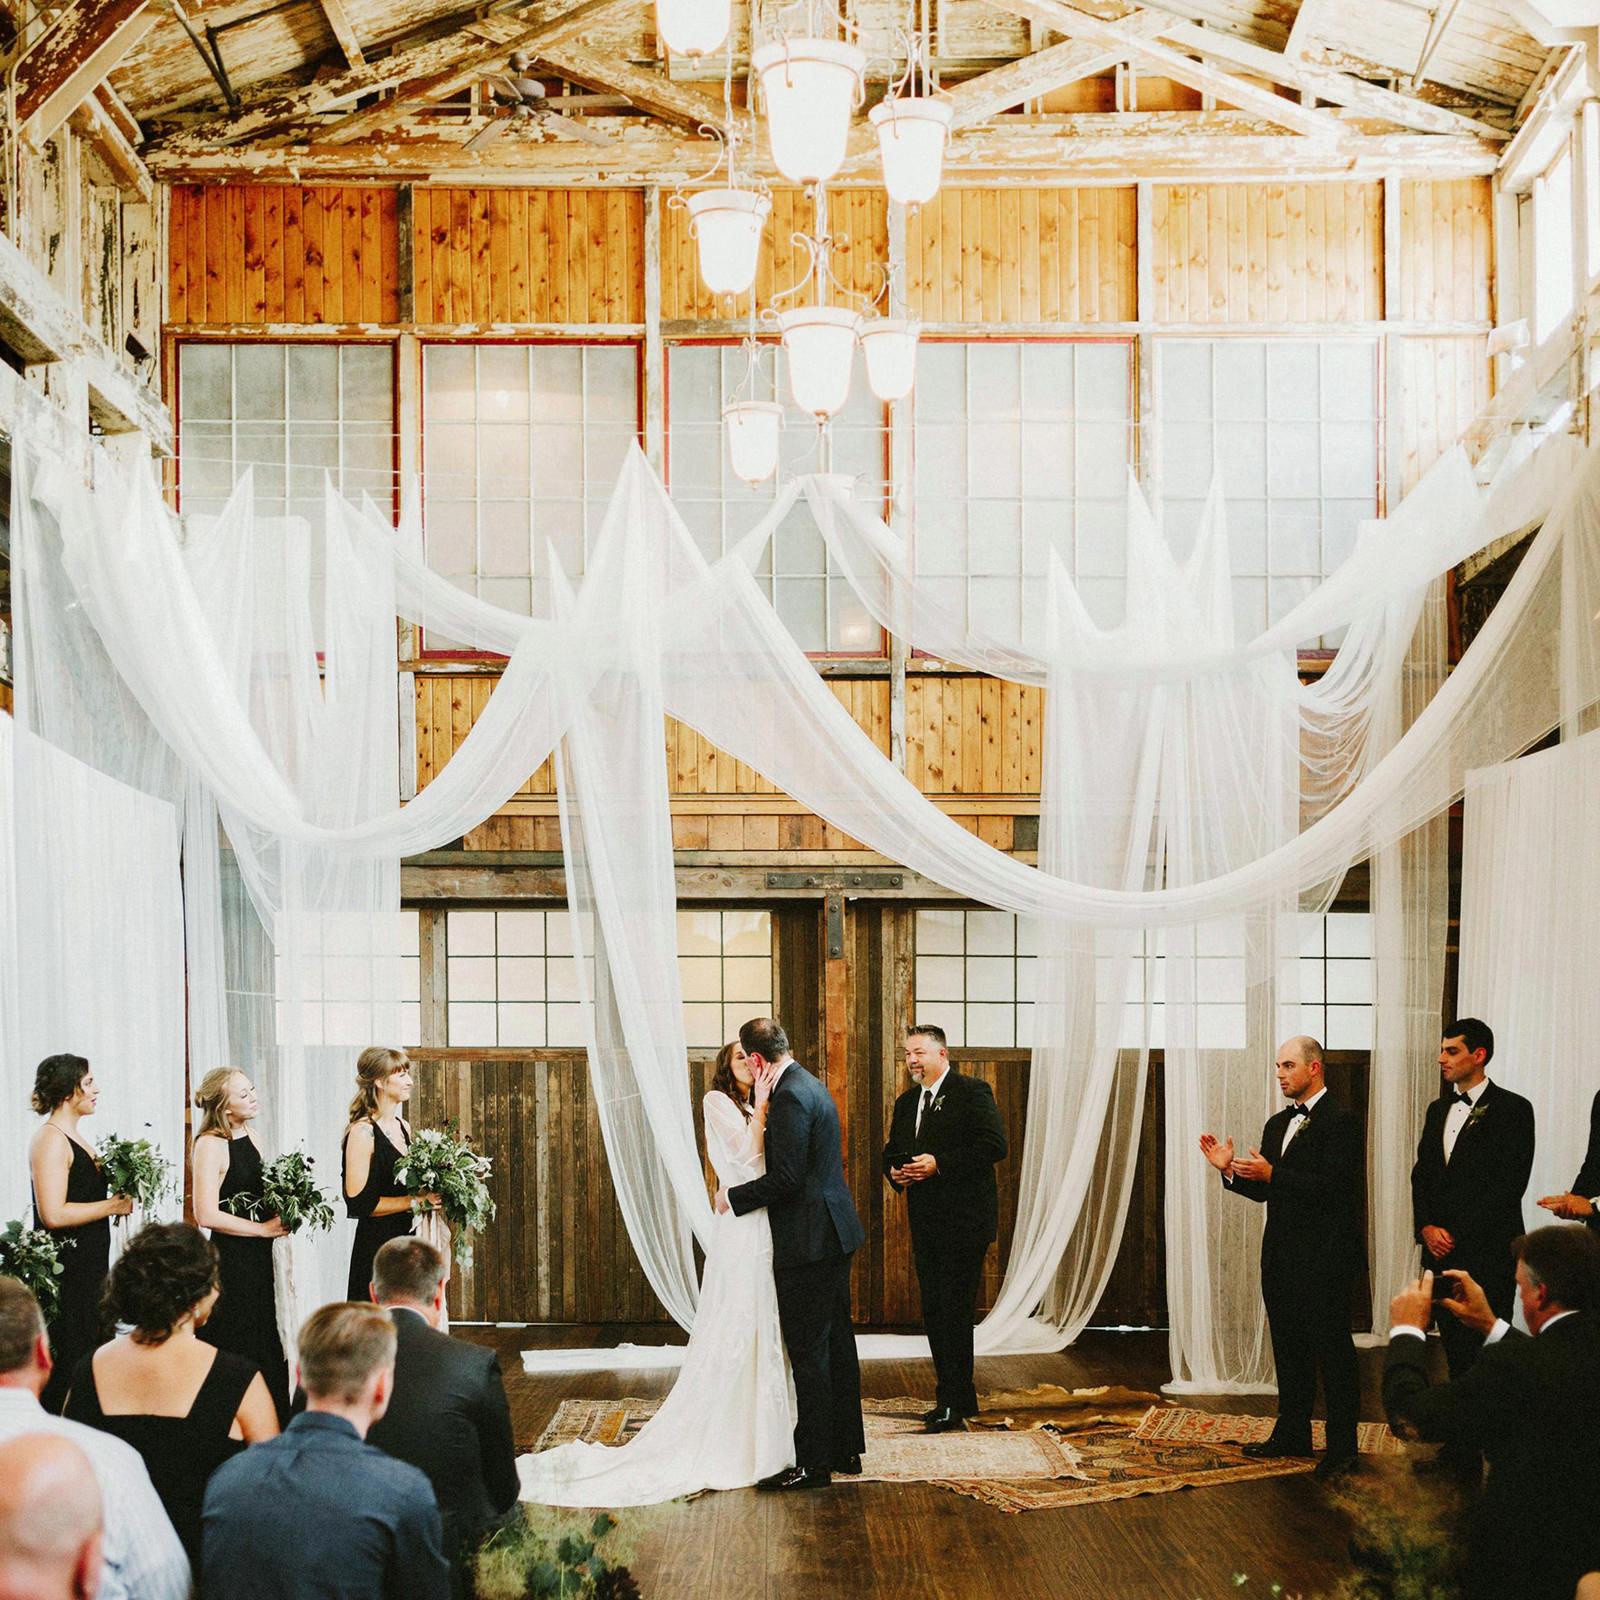 sodo-park-wedding-046 SODO PARK WEDDING